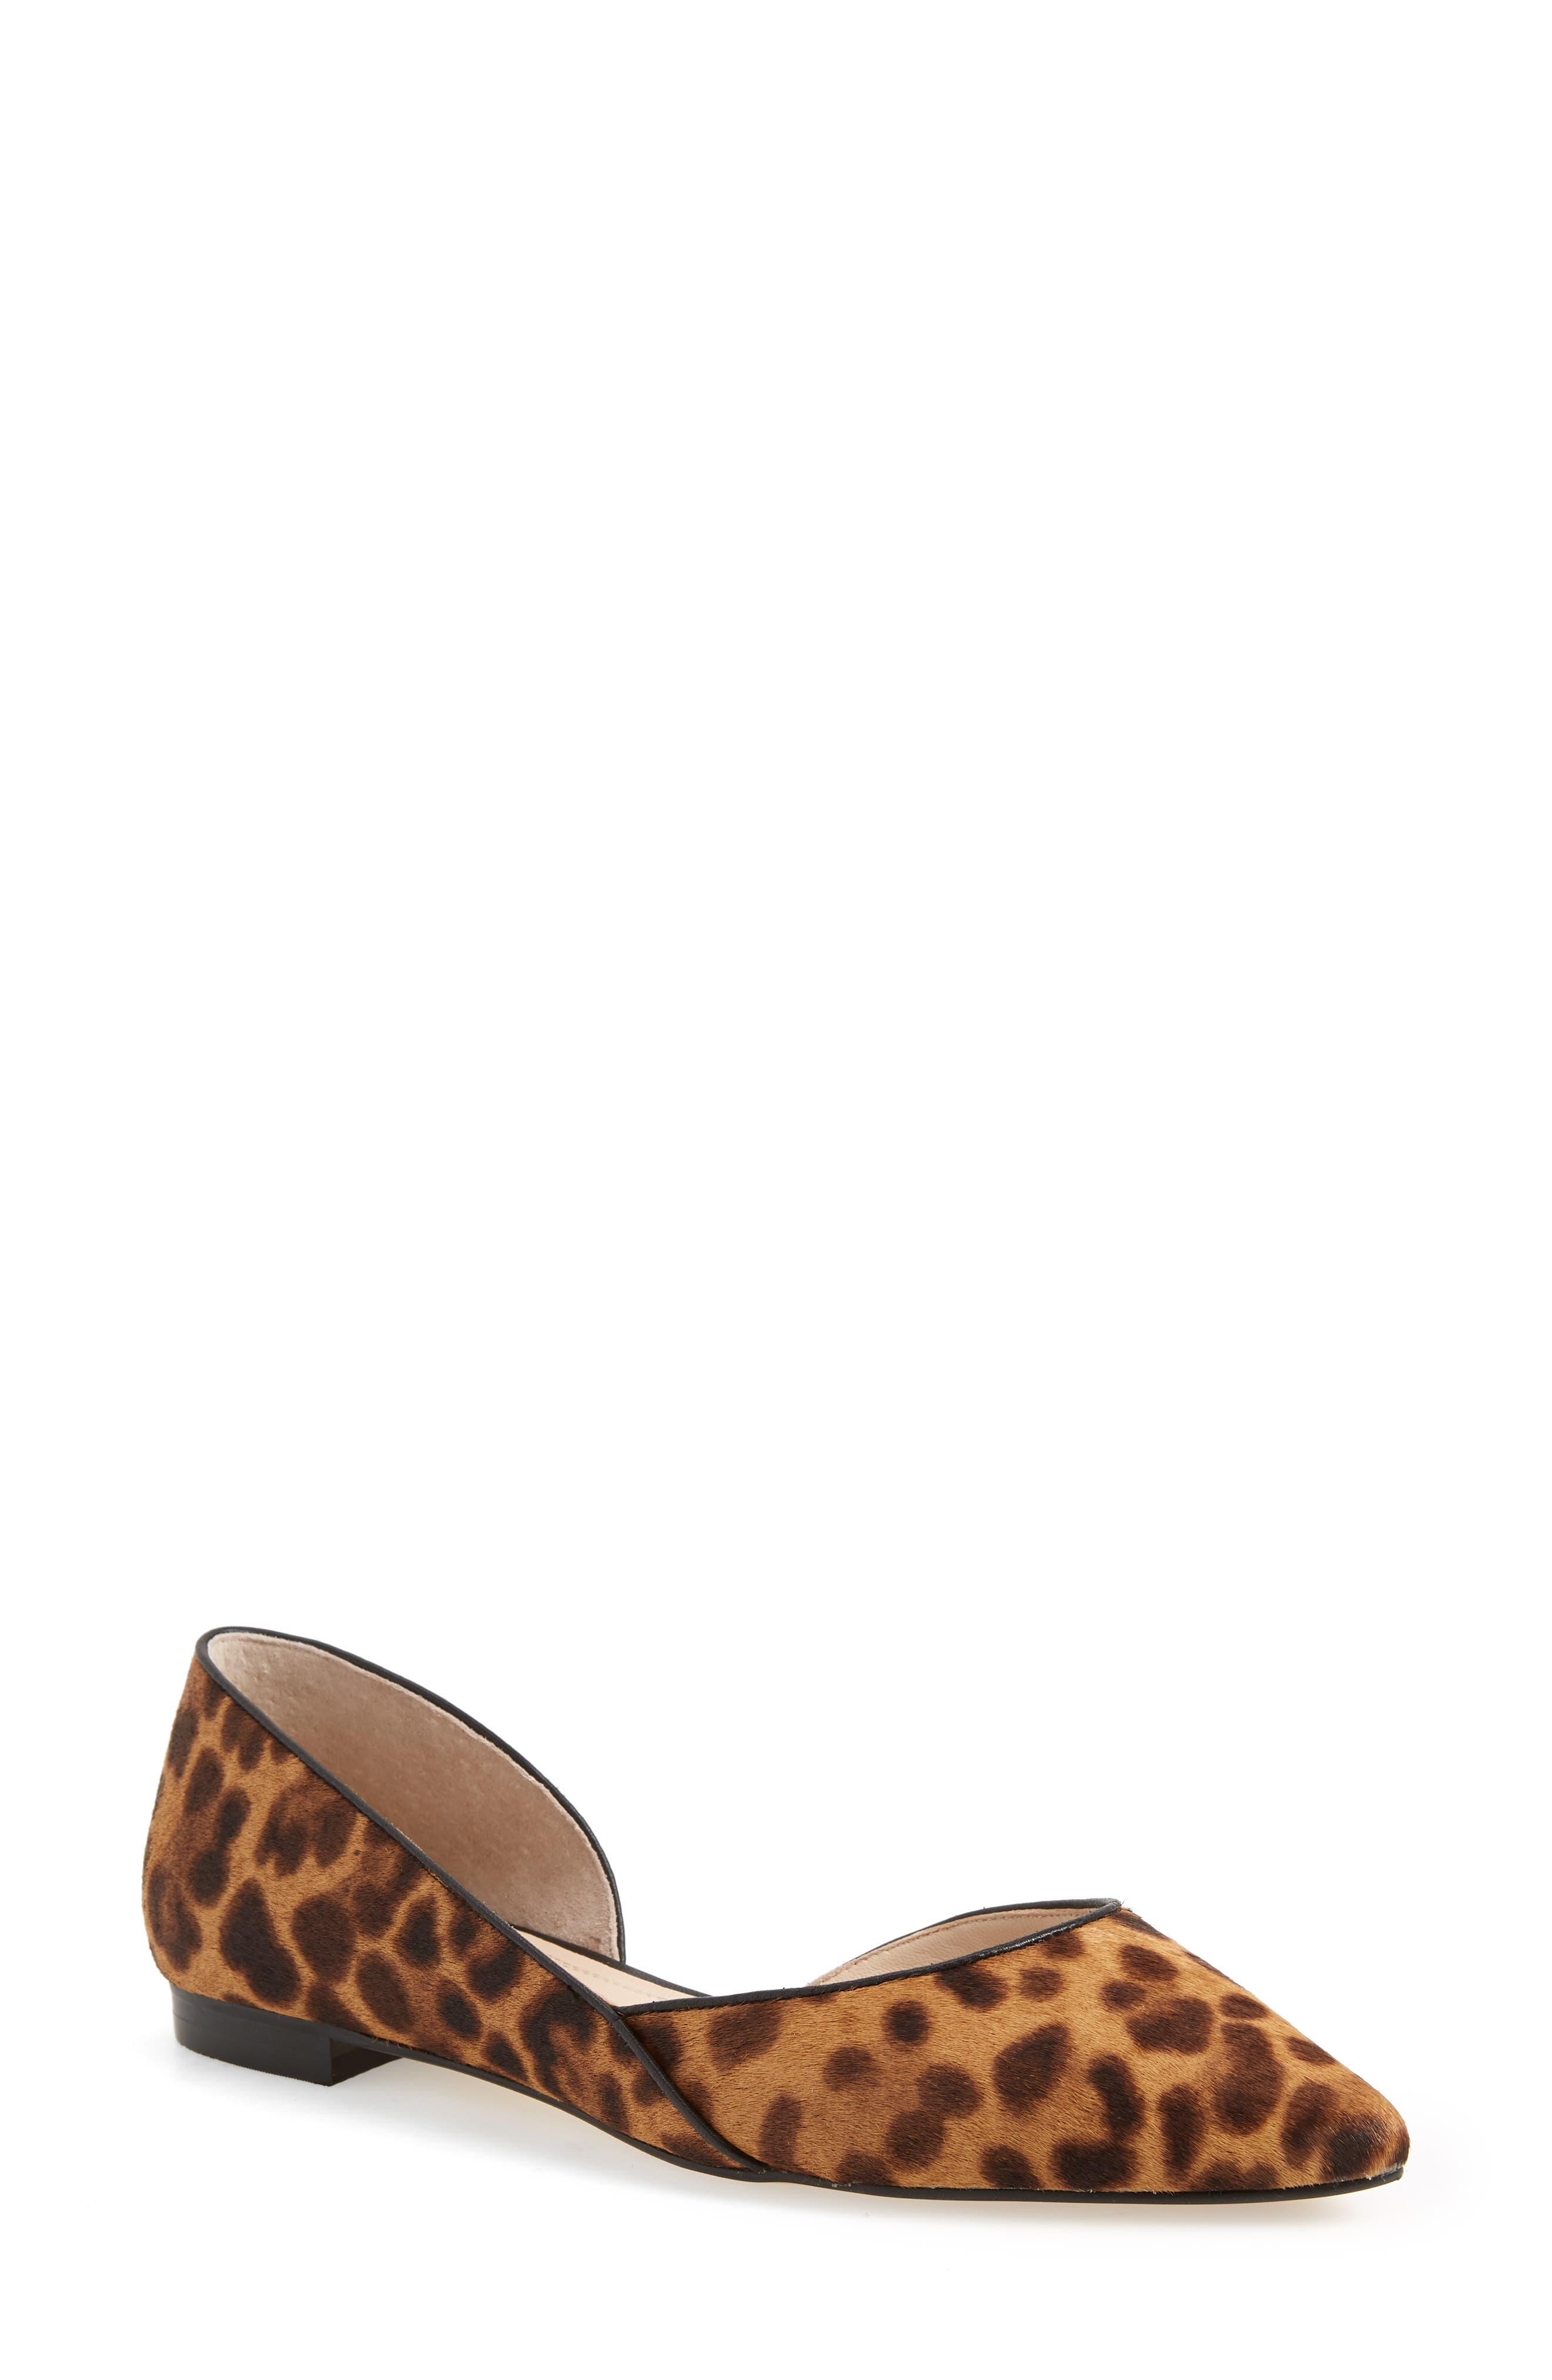 Sunny Genuine Calf Hair Flat,                         Main,                         color, Leopard Calf Hair